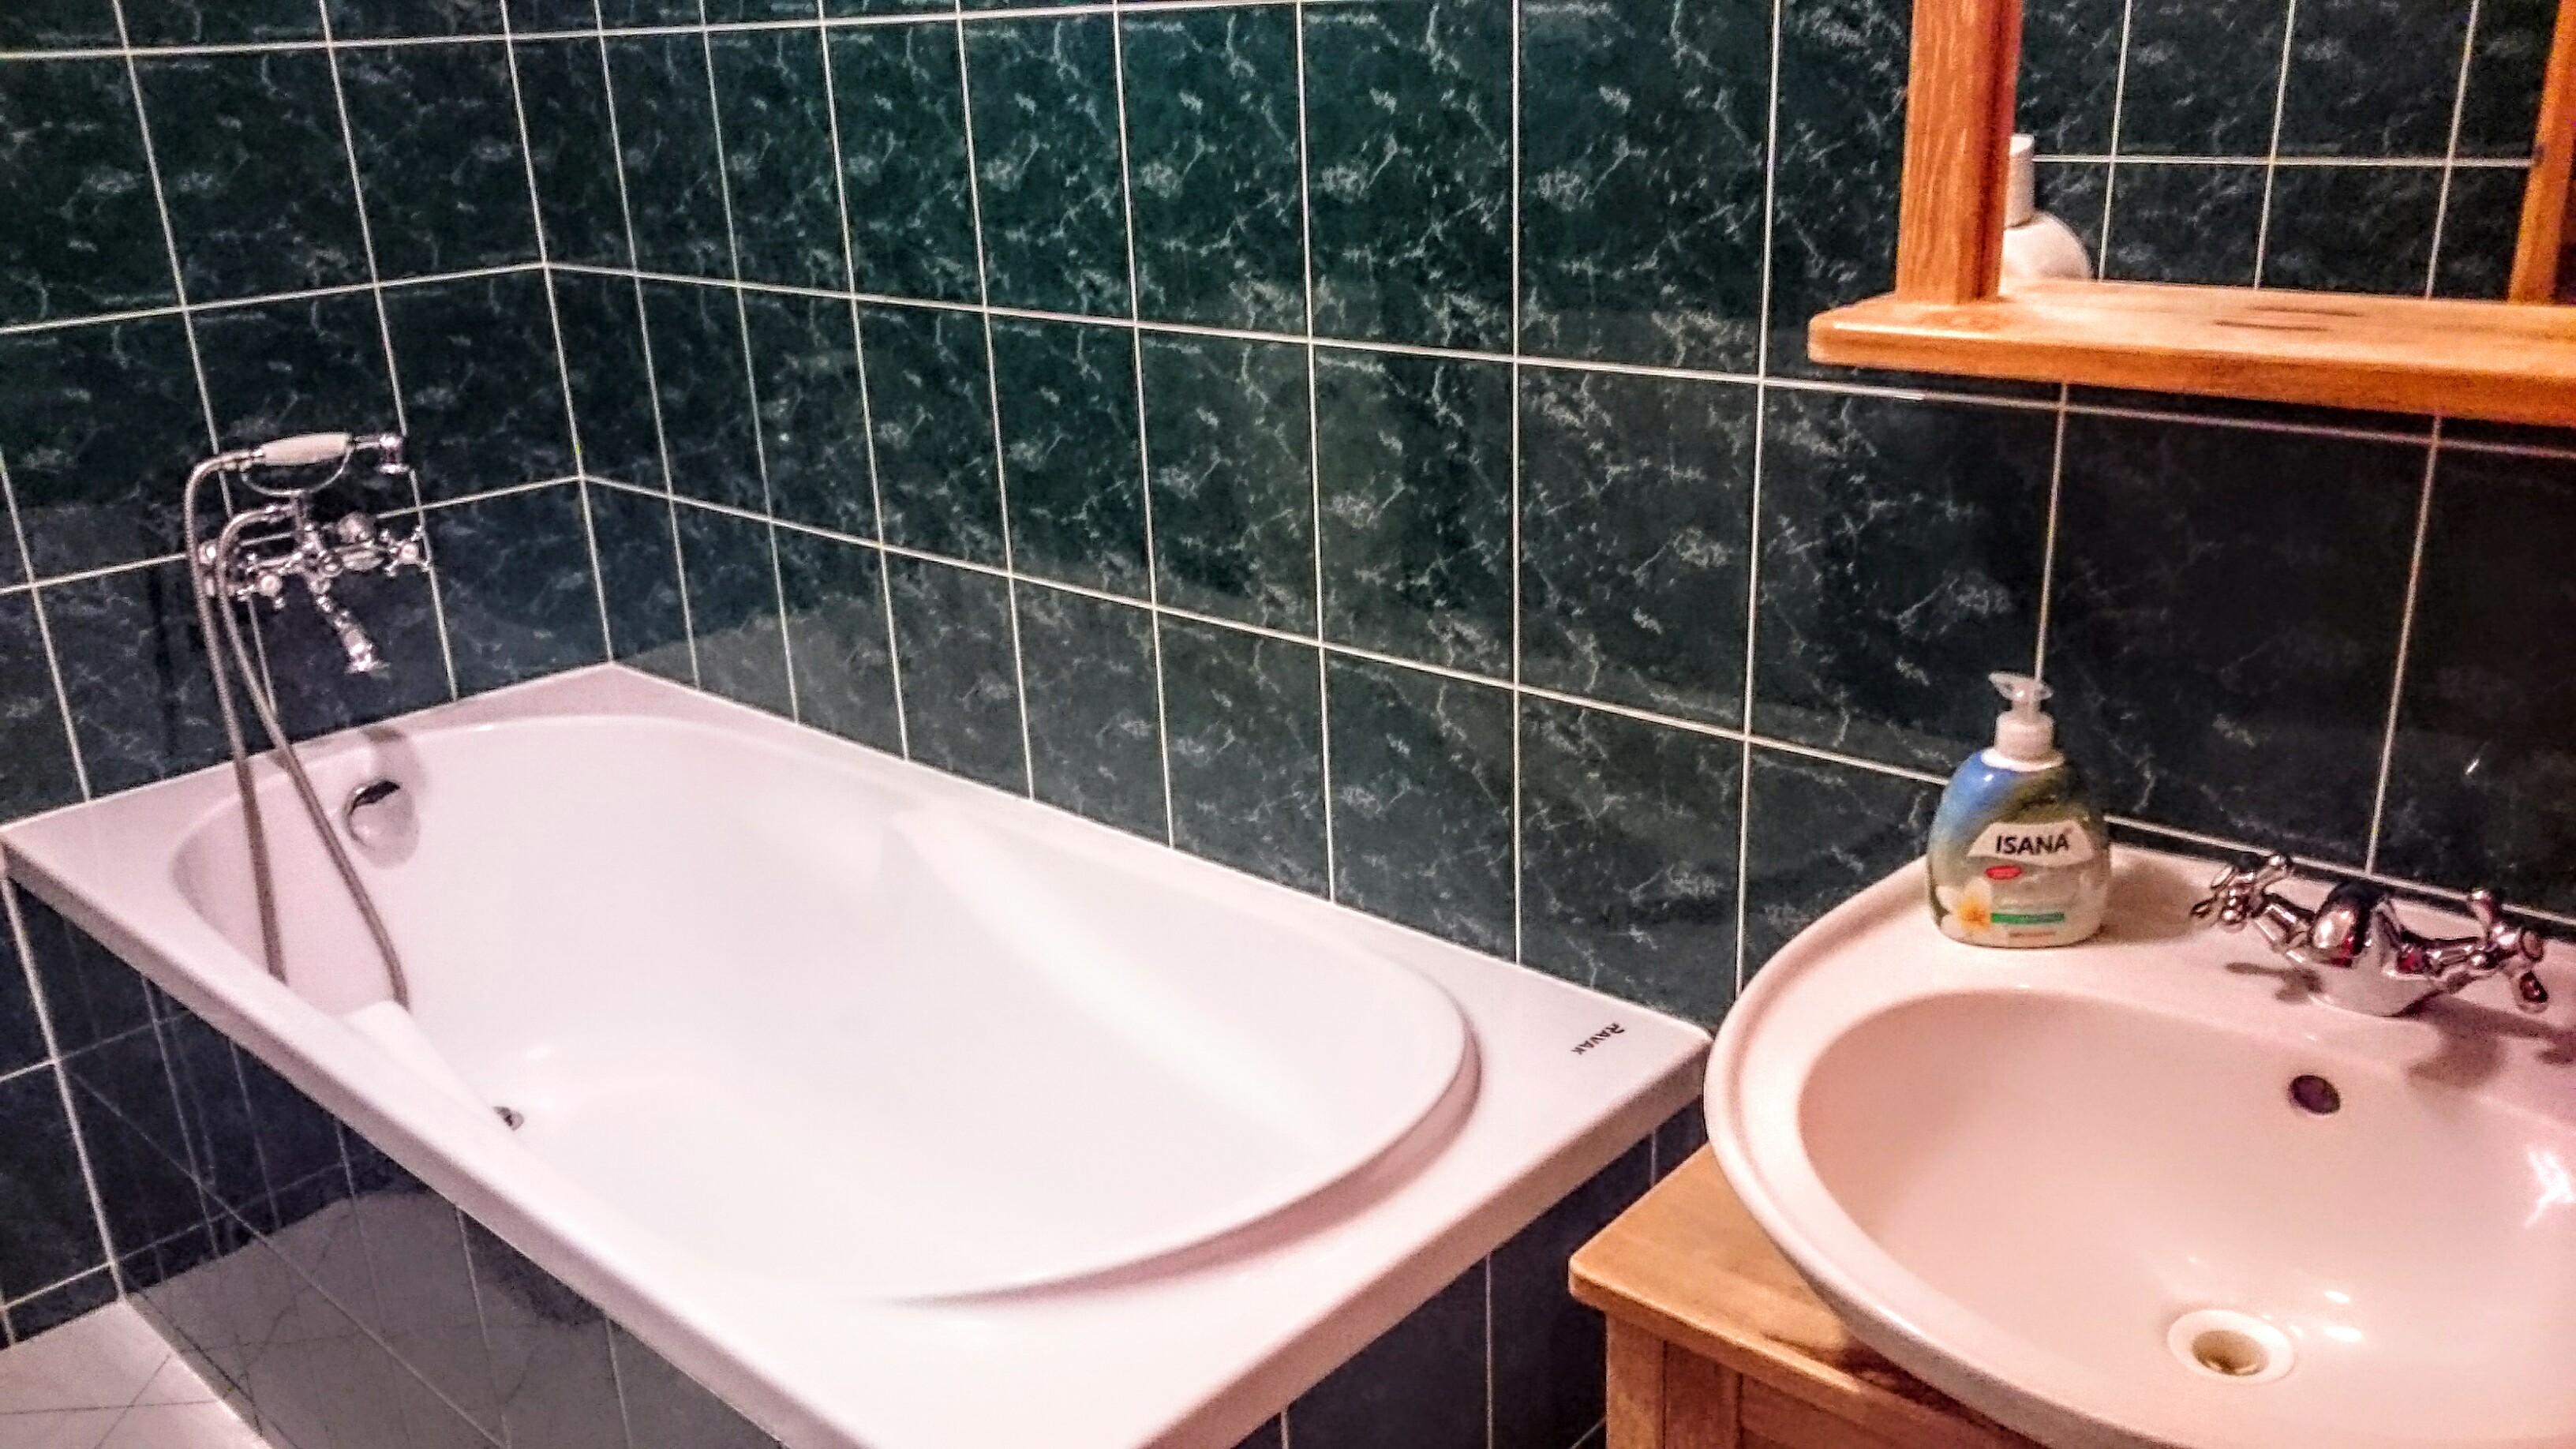 Koupelna / Badezimmer / Bathroom